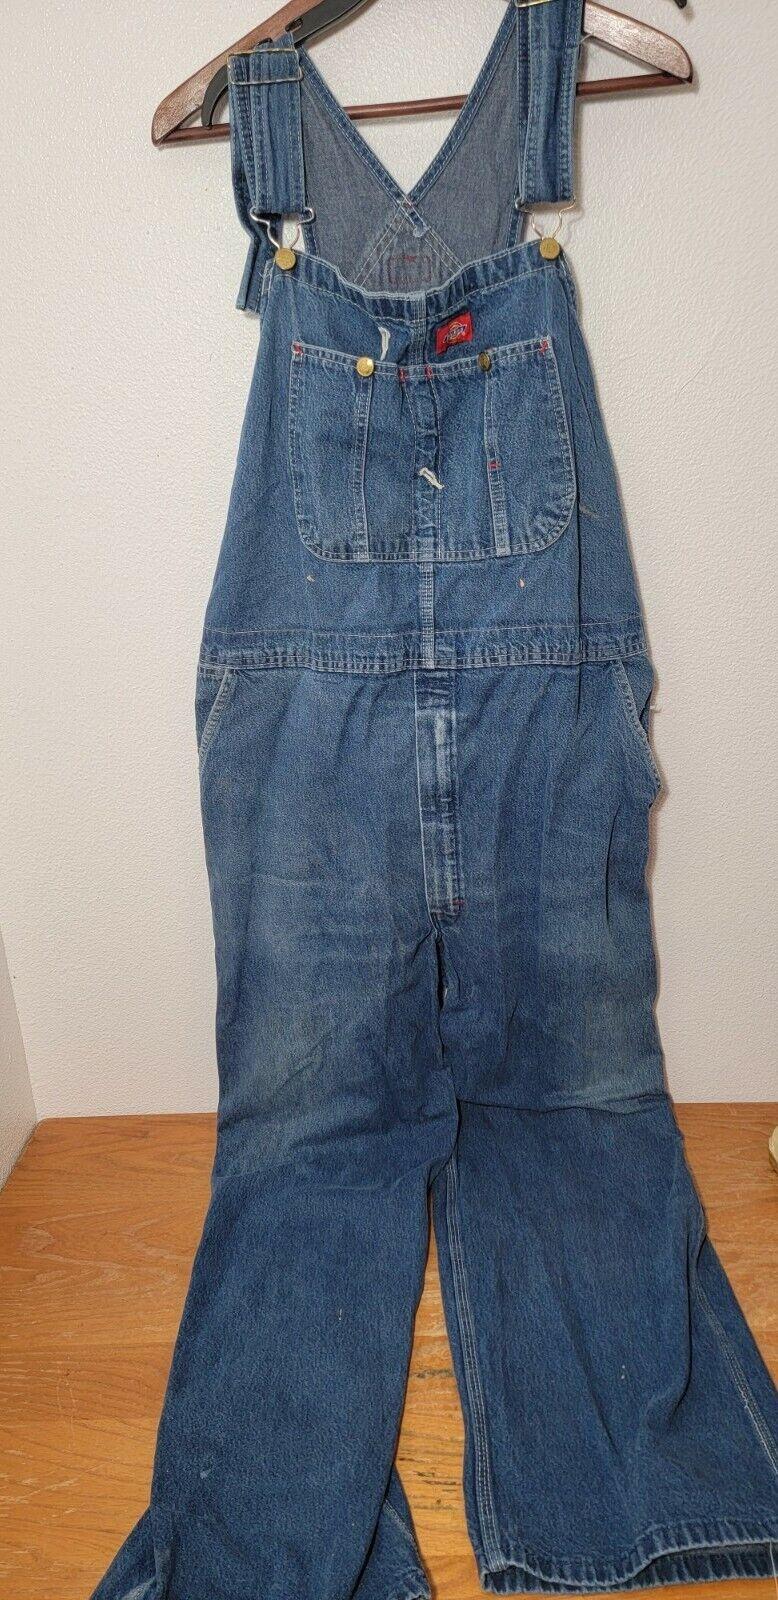 Dickies Bib Overalls Mens Size 44x30 Distressed - image 1